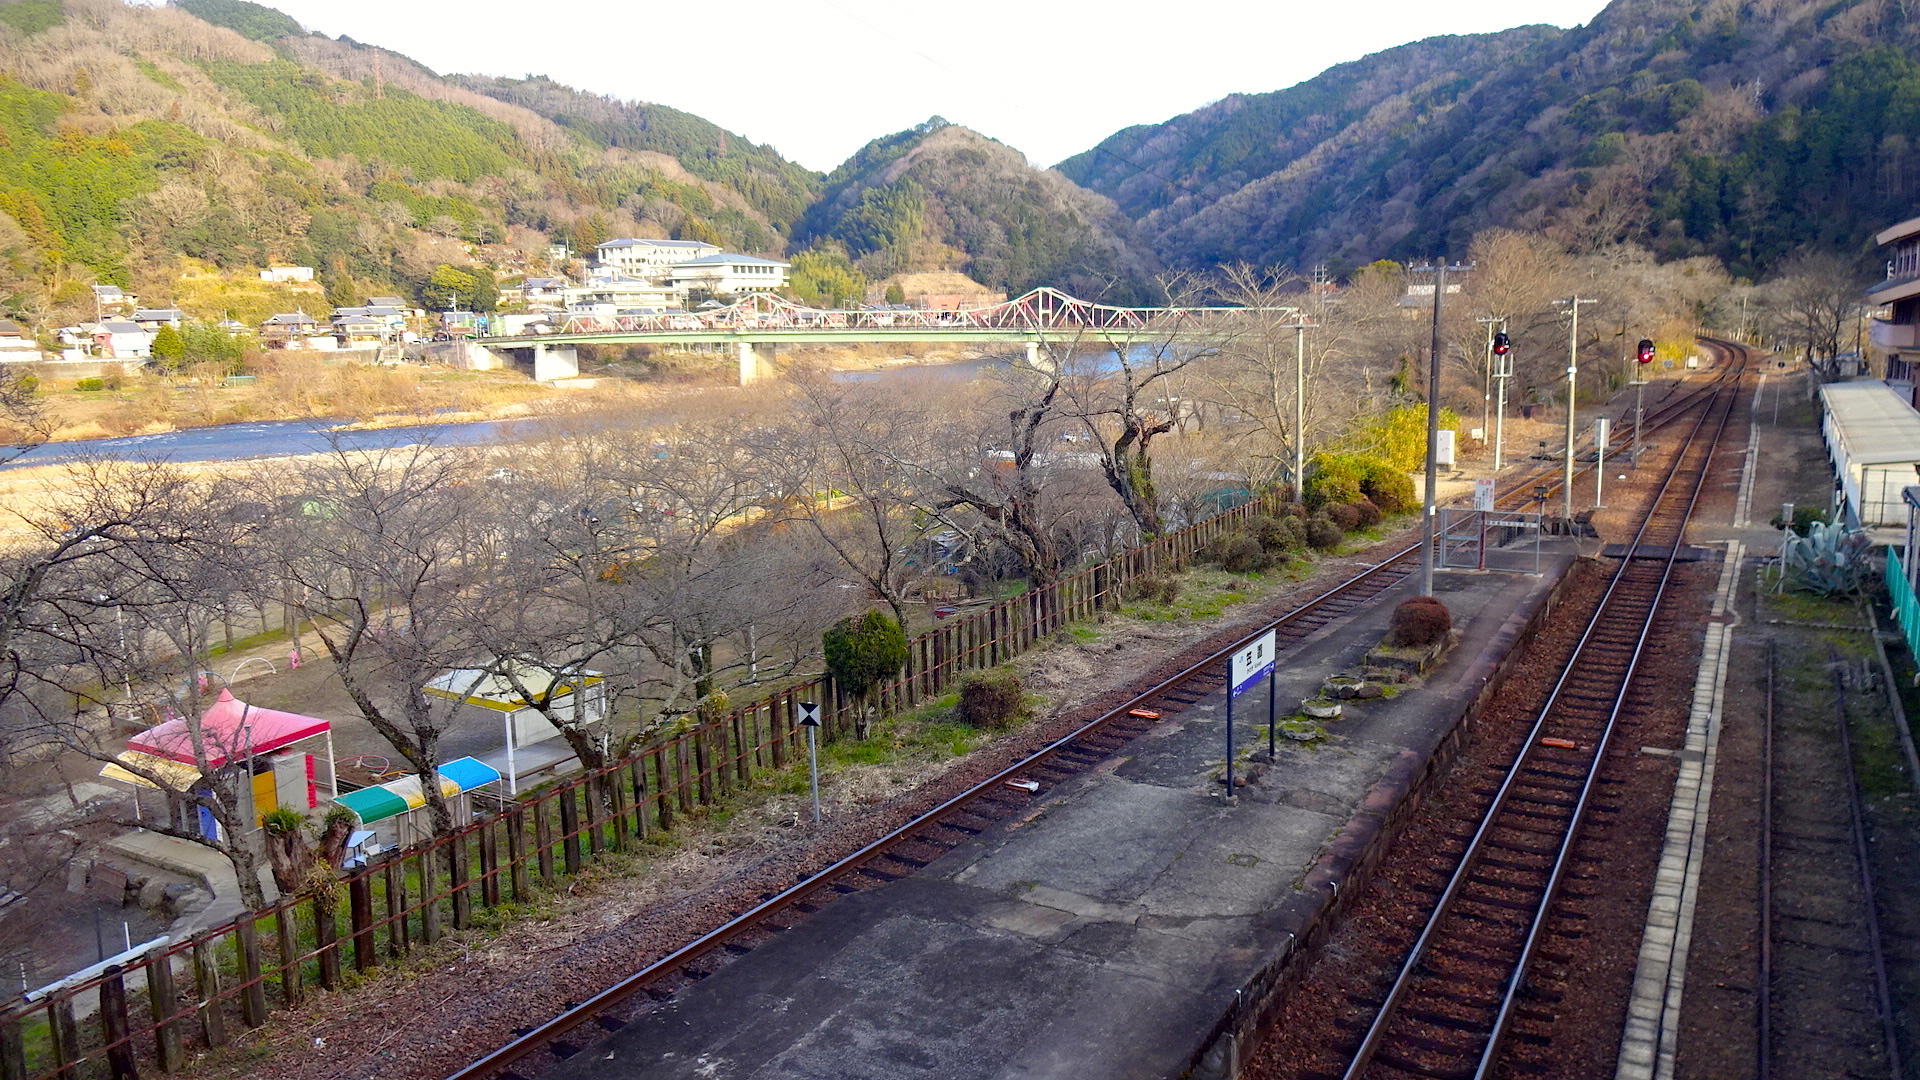 http://cdn-ak.f.st-hatena.com/images/fotolife/s/shioshiohida/20171228/20171228152304_original.jpg?1514560605